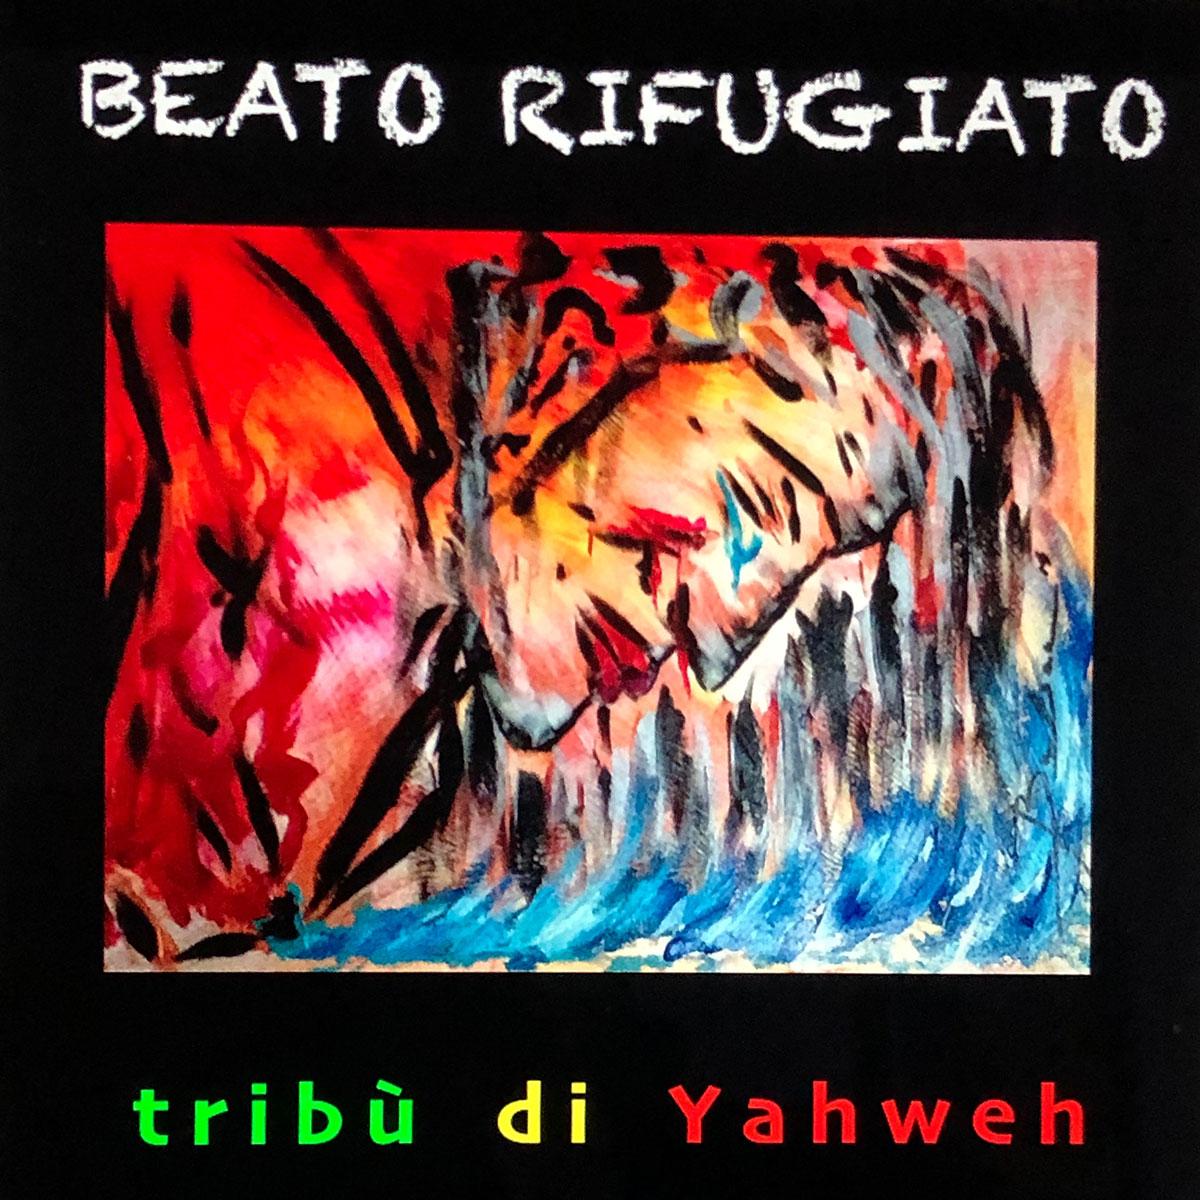 http://www.tribudiyahweh.com/wp/wp-content/uploads/2019/02/Beato-rifugiato.jpg